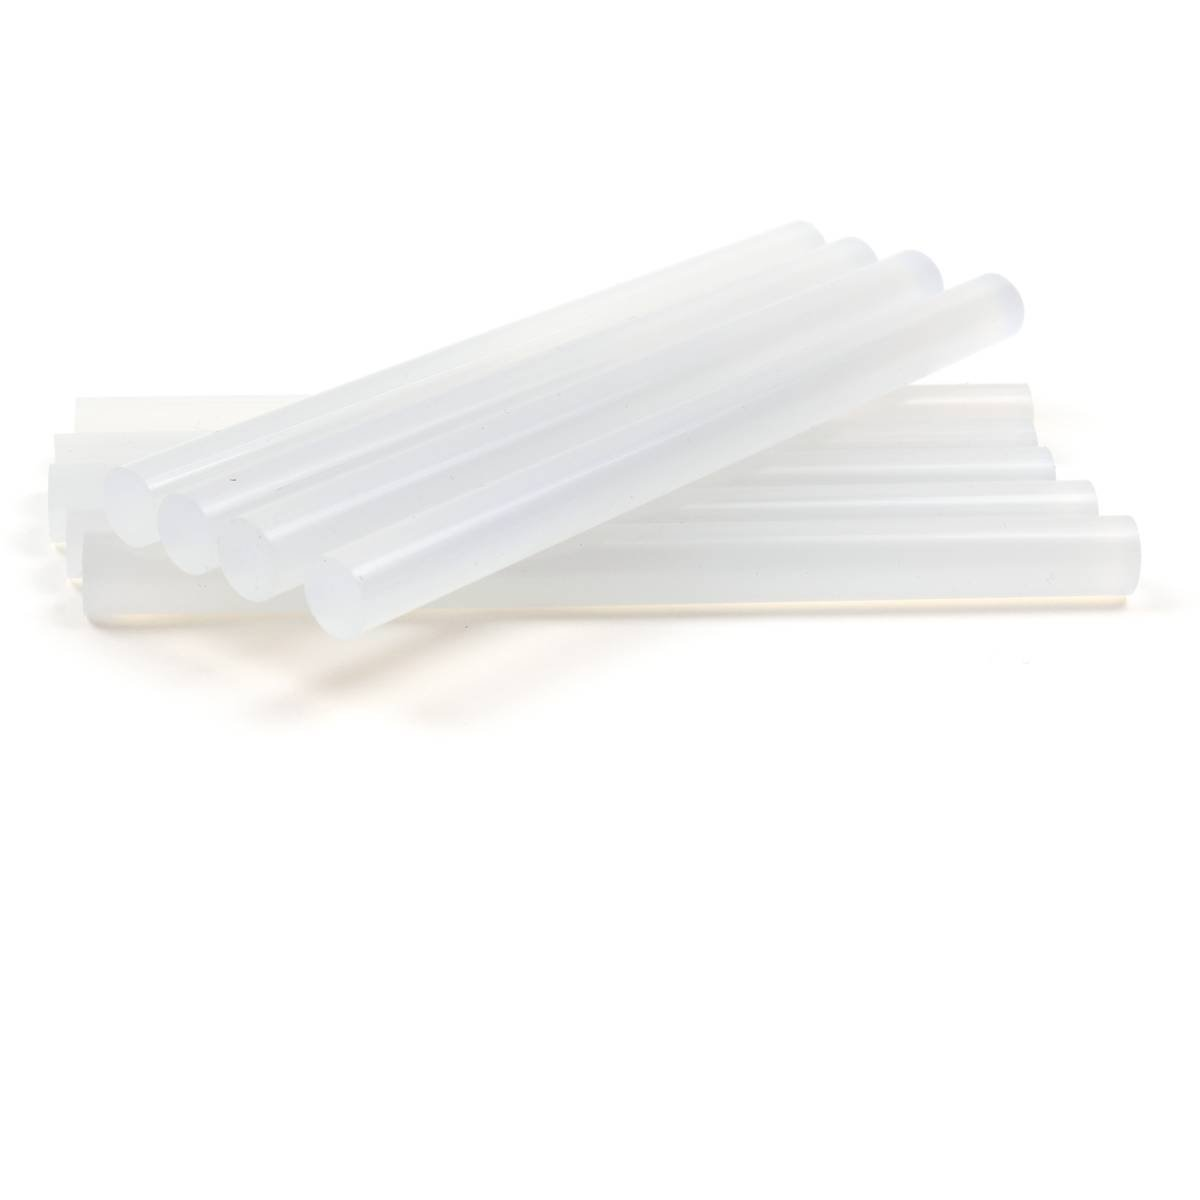 Heirloom Quality All Purpose Hot Melt Glue Sticks (Set Of 10)